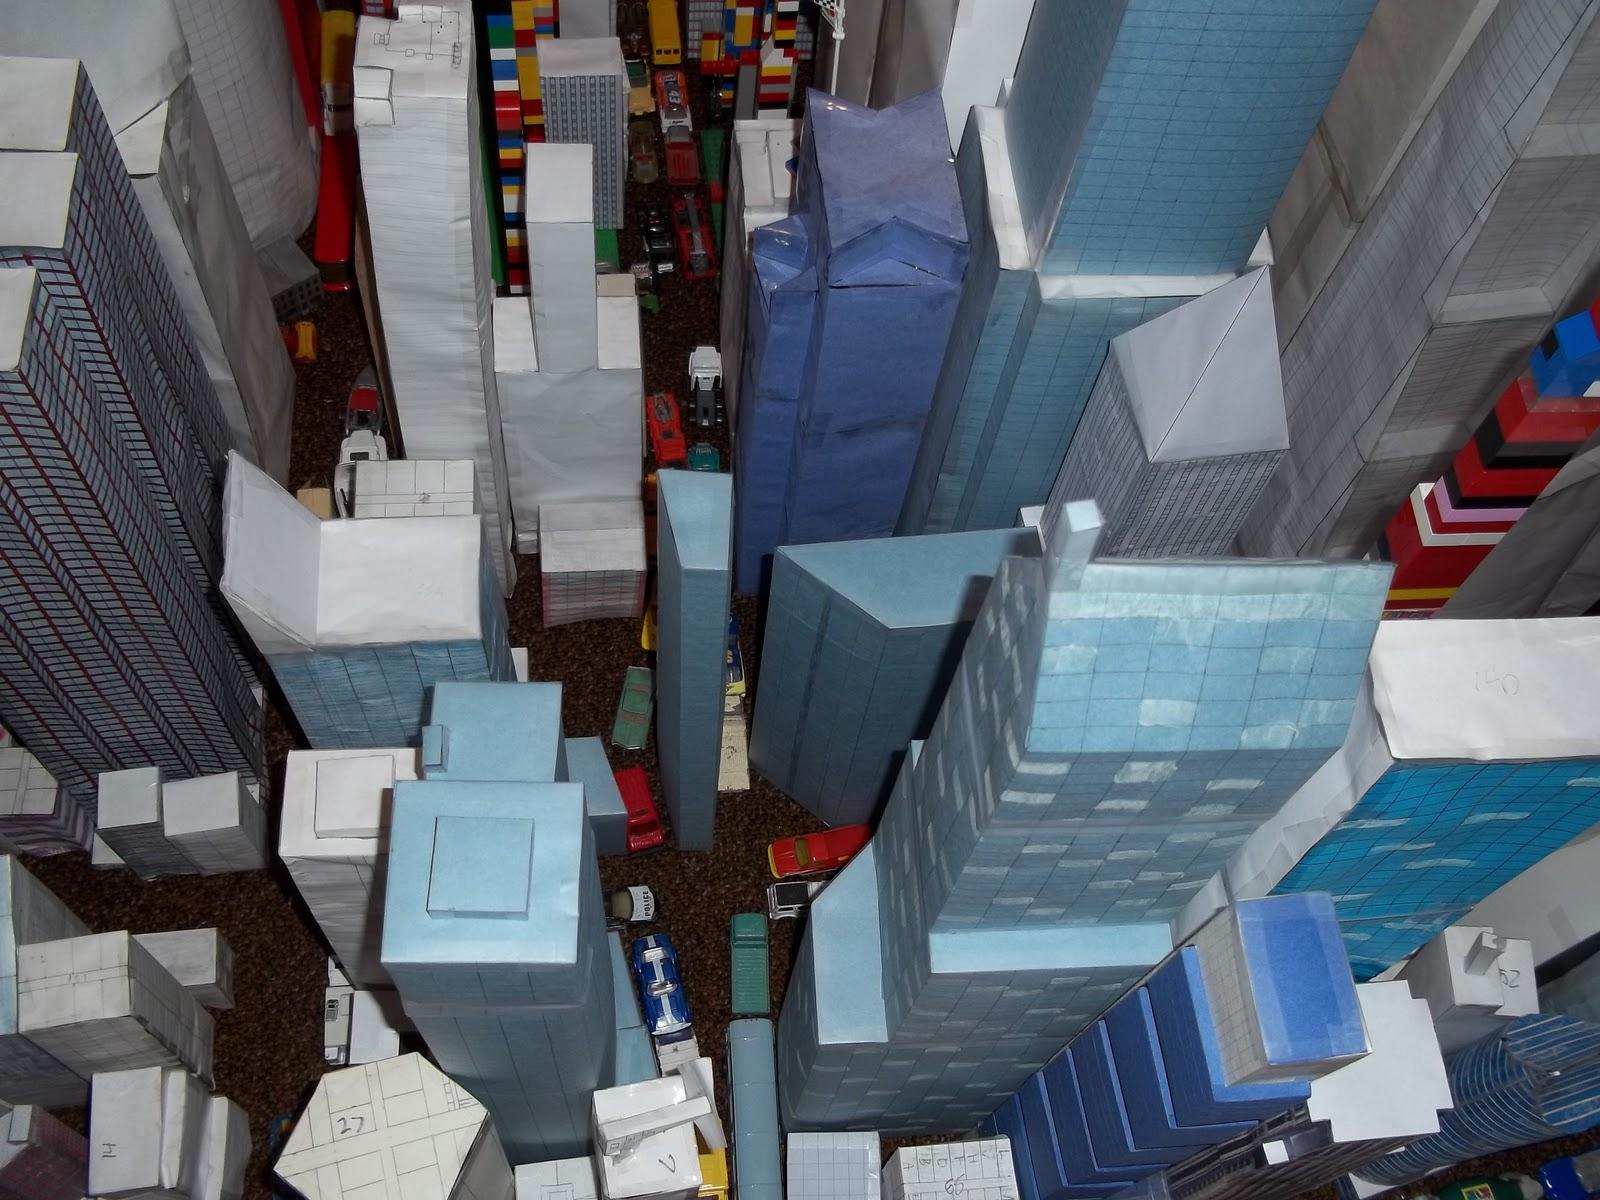 My Paper Model City